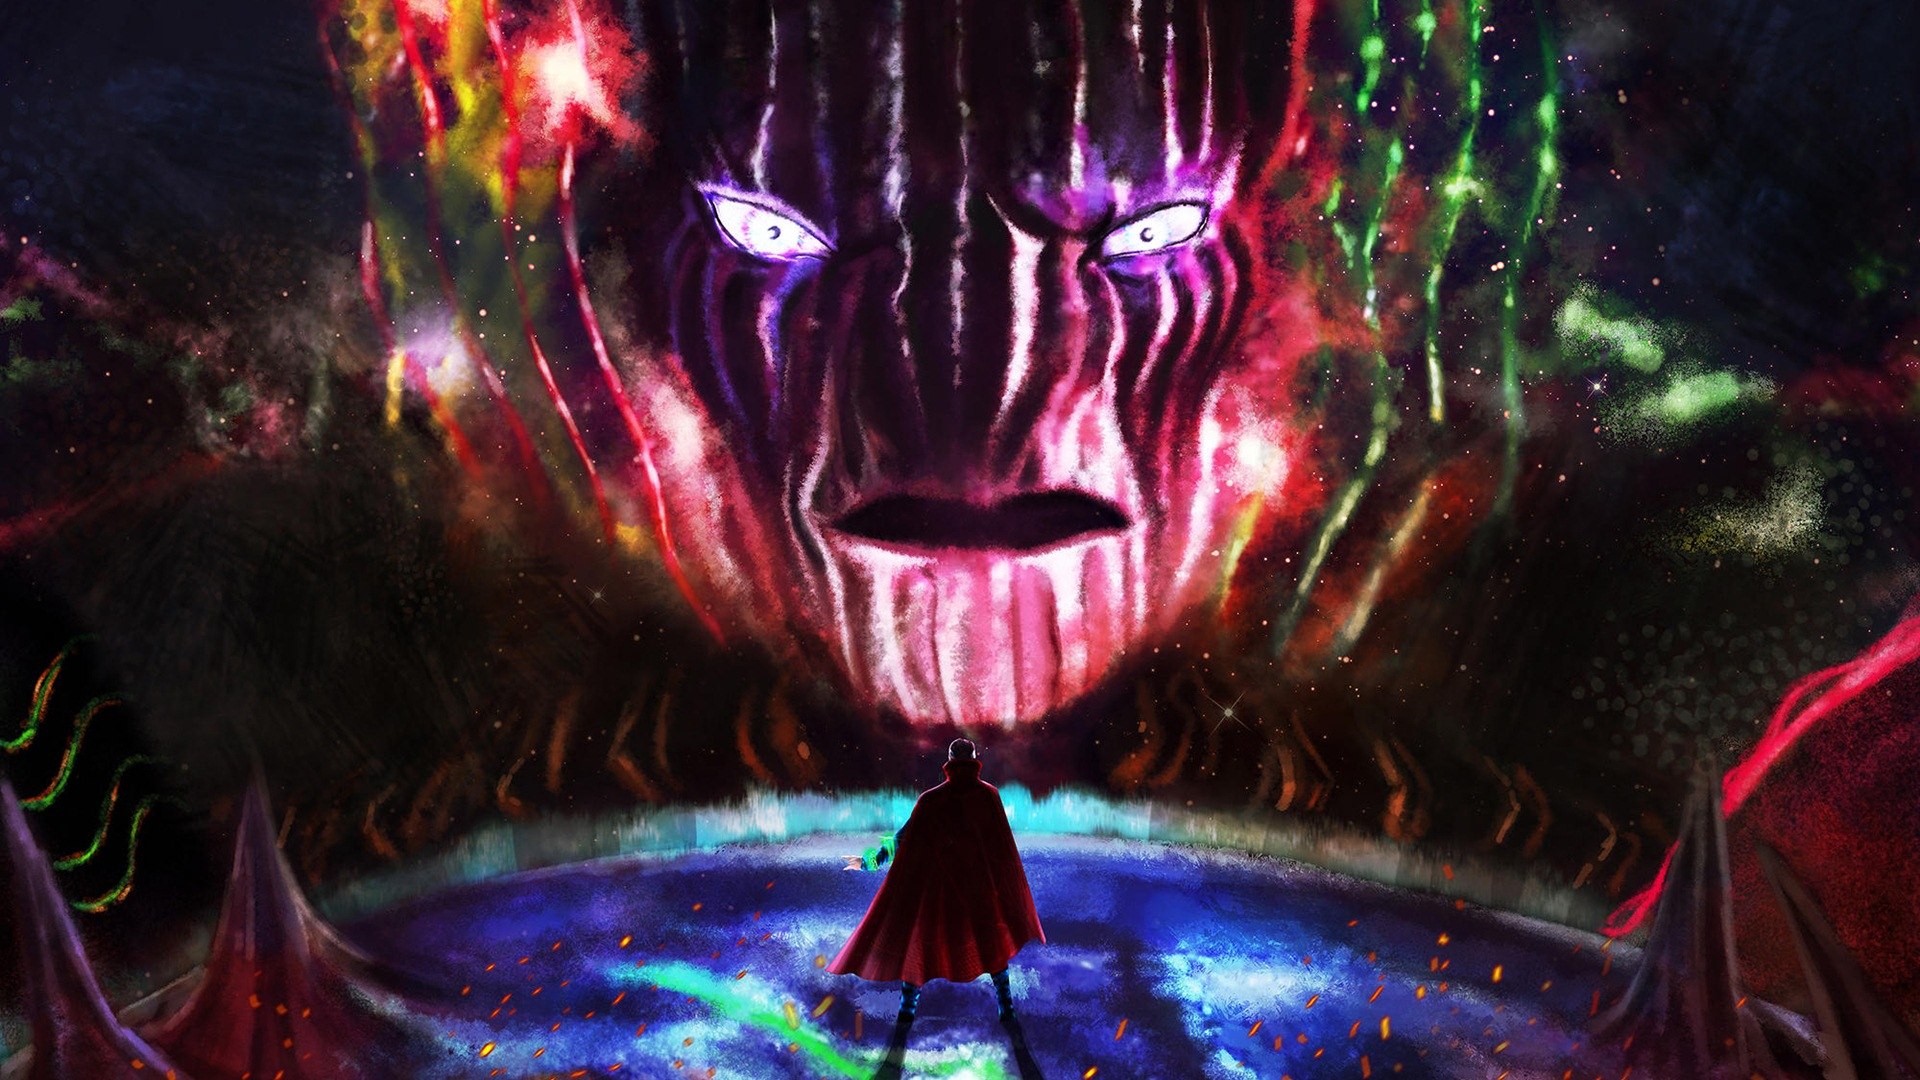 Doctor Strange Desktop Wallpaper - Doctor Strange Hd Wallpaper For Pc , HD Wallpaper & Backgrounds